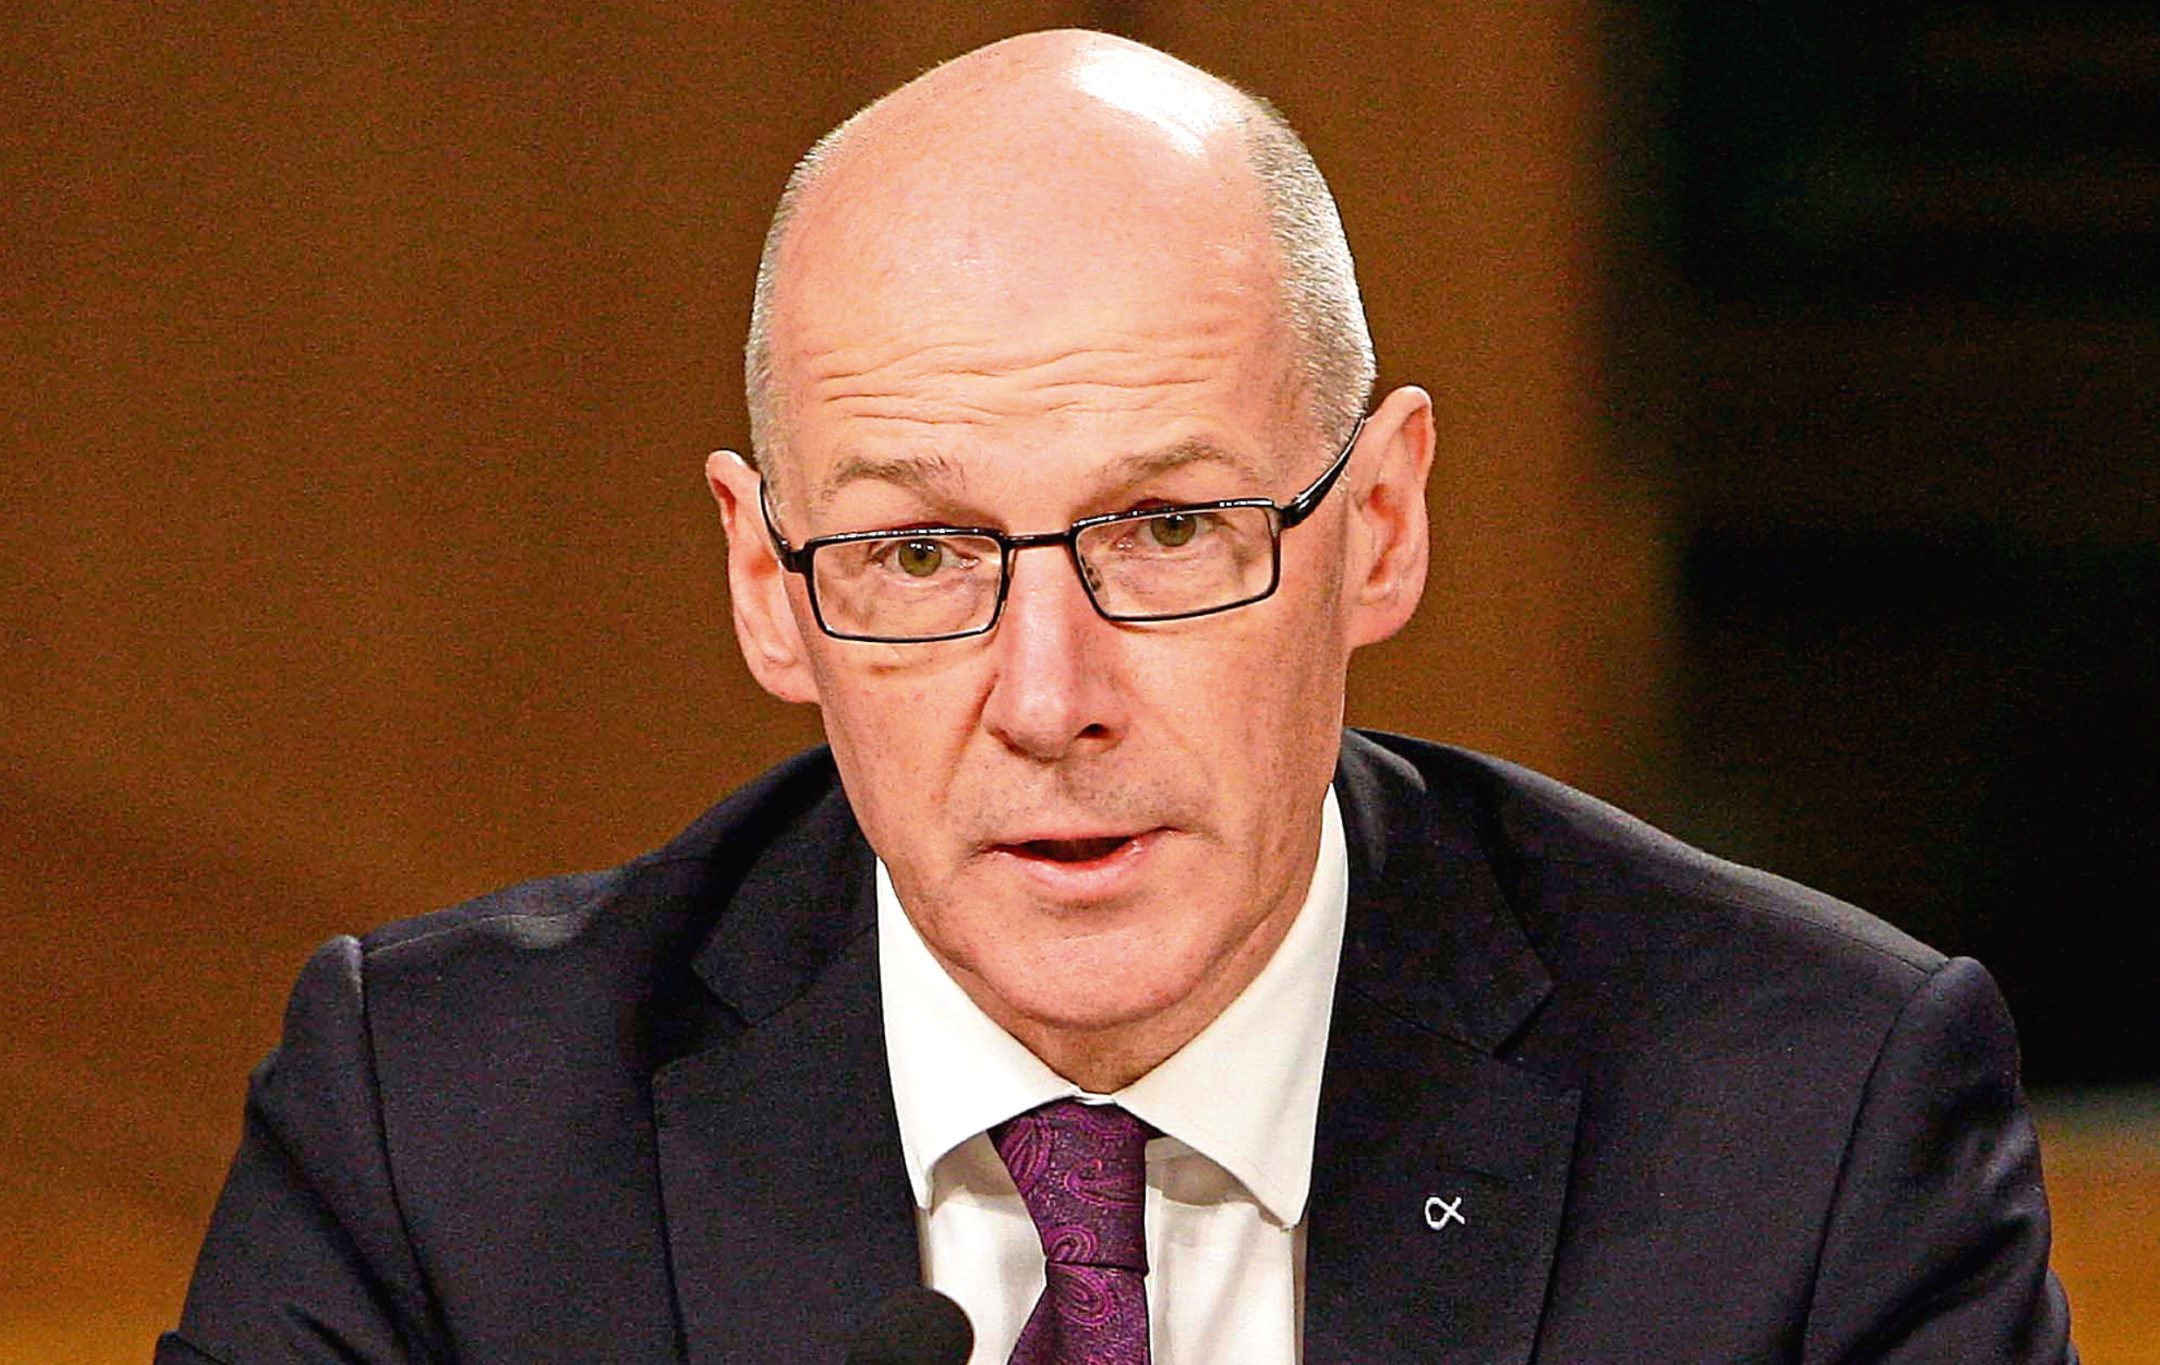 John Swinney, Cabinet Secretary for Education and Skills (Andrew Cowan/Scottish Parliament)